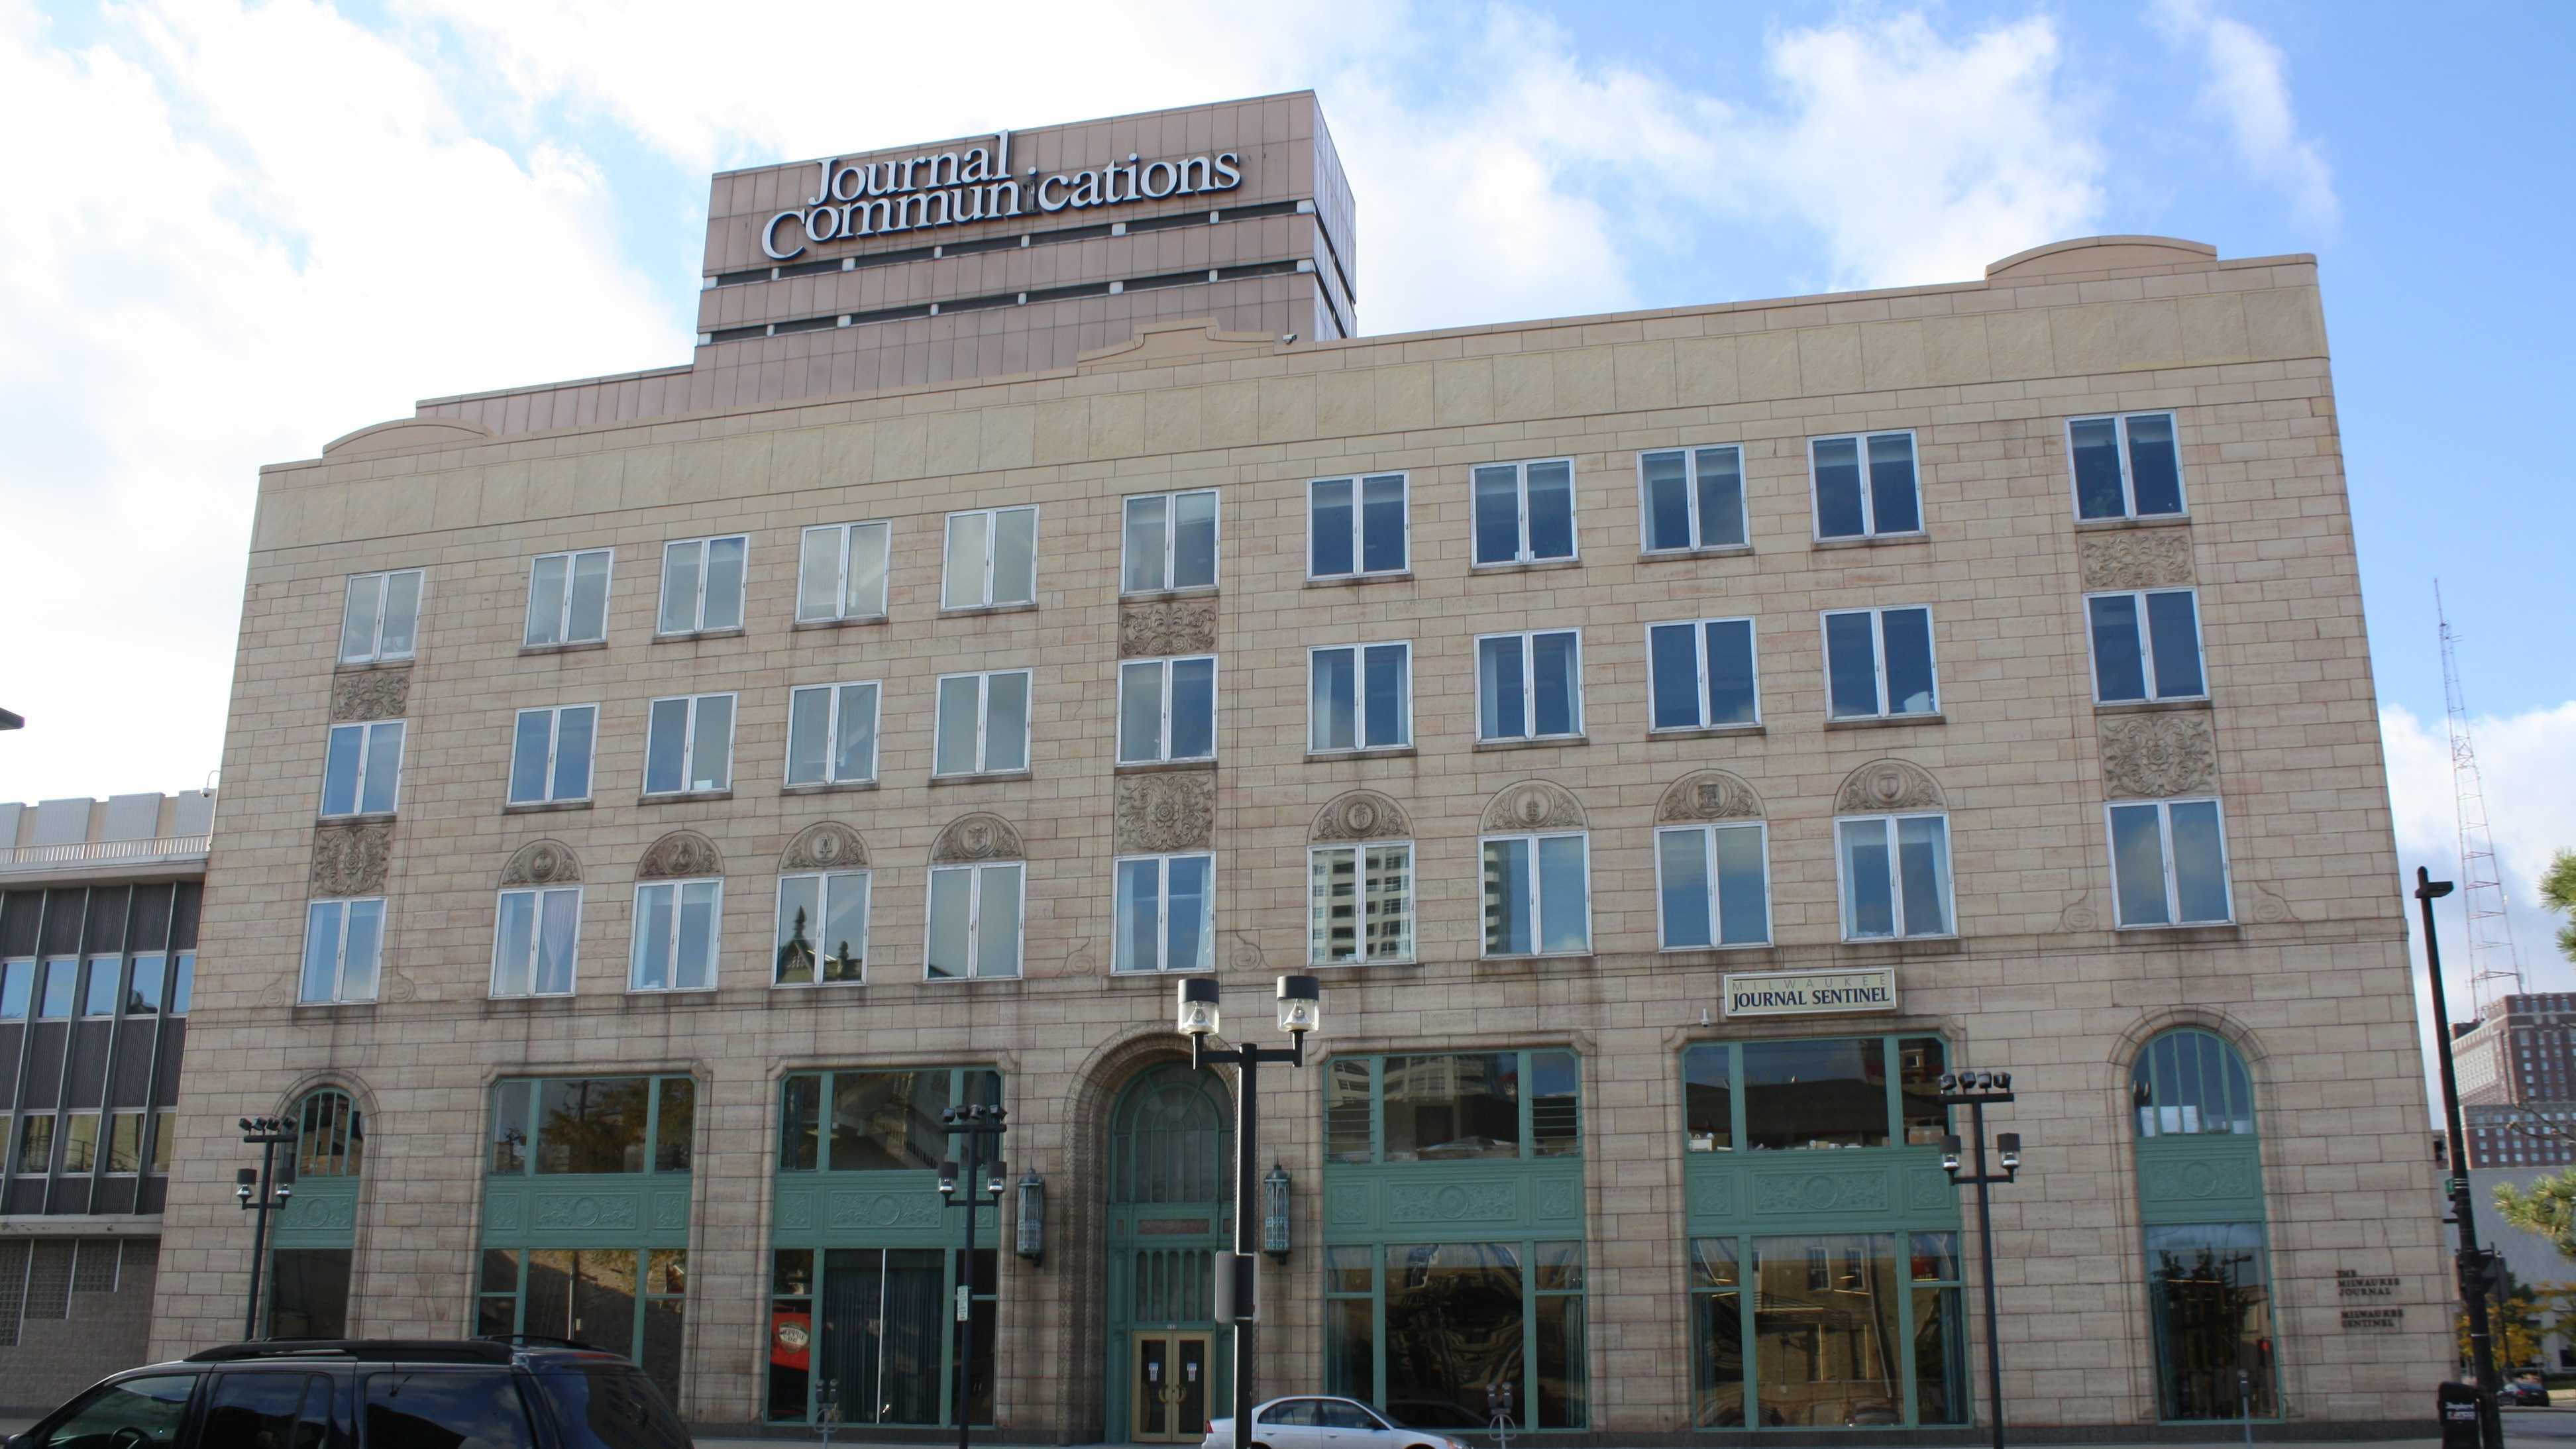 Journal_Communications_Building_Milwaukee_Wisconsin.jpg